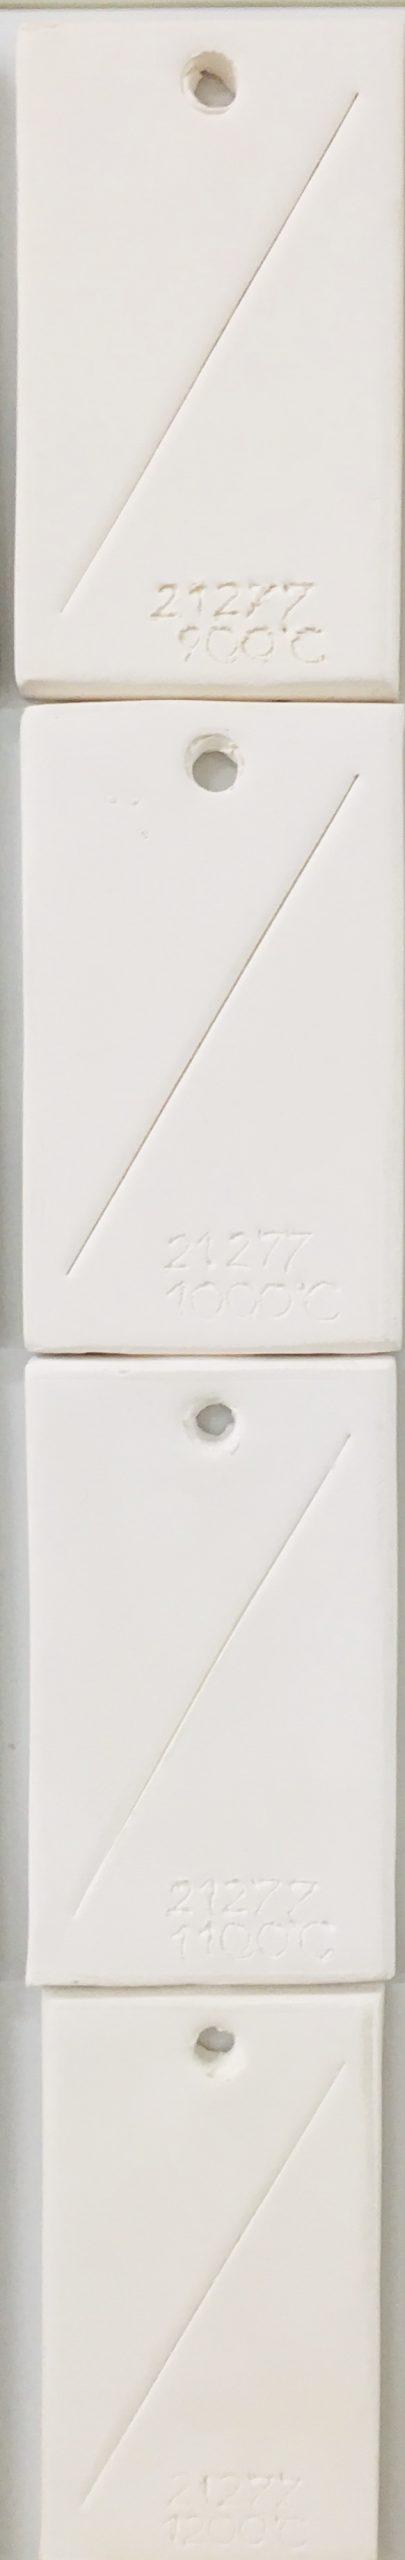 Drehton, Börkey, Berlin, weiß, Keramik, Kunst